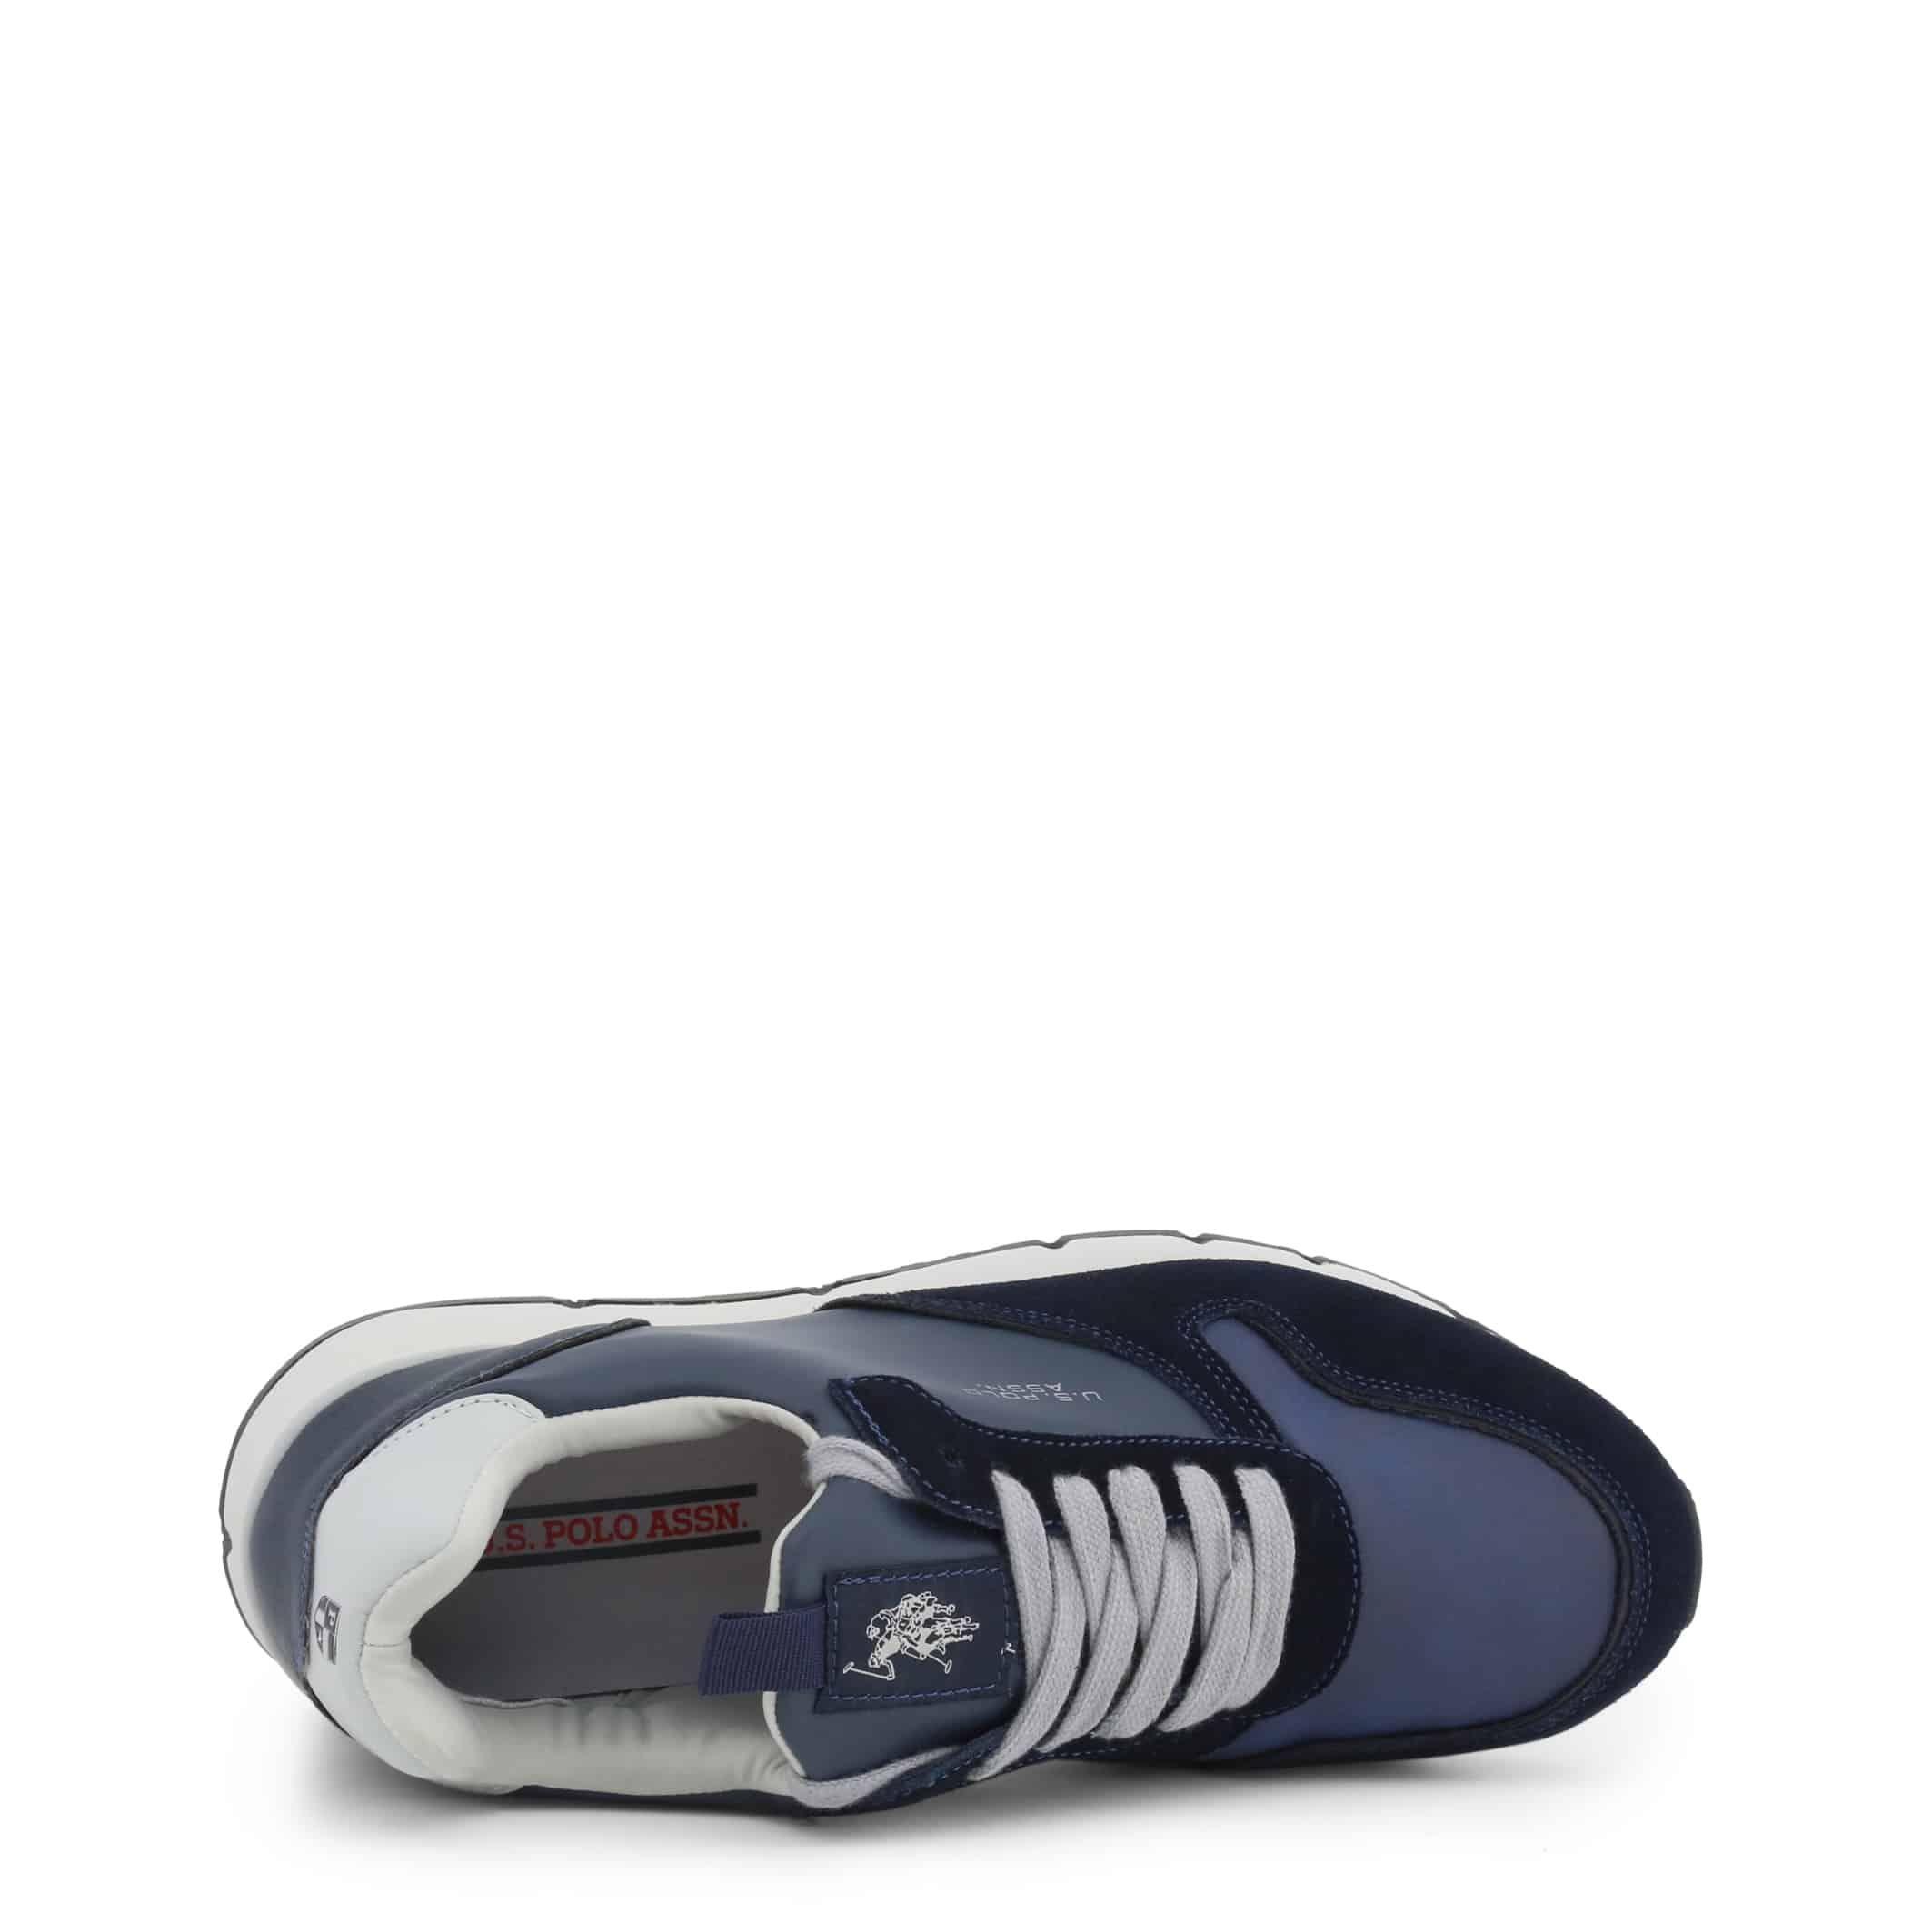 U.S. Polo Assn. - MAXIL4058S9_YS2  | You Fashion Outlet